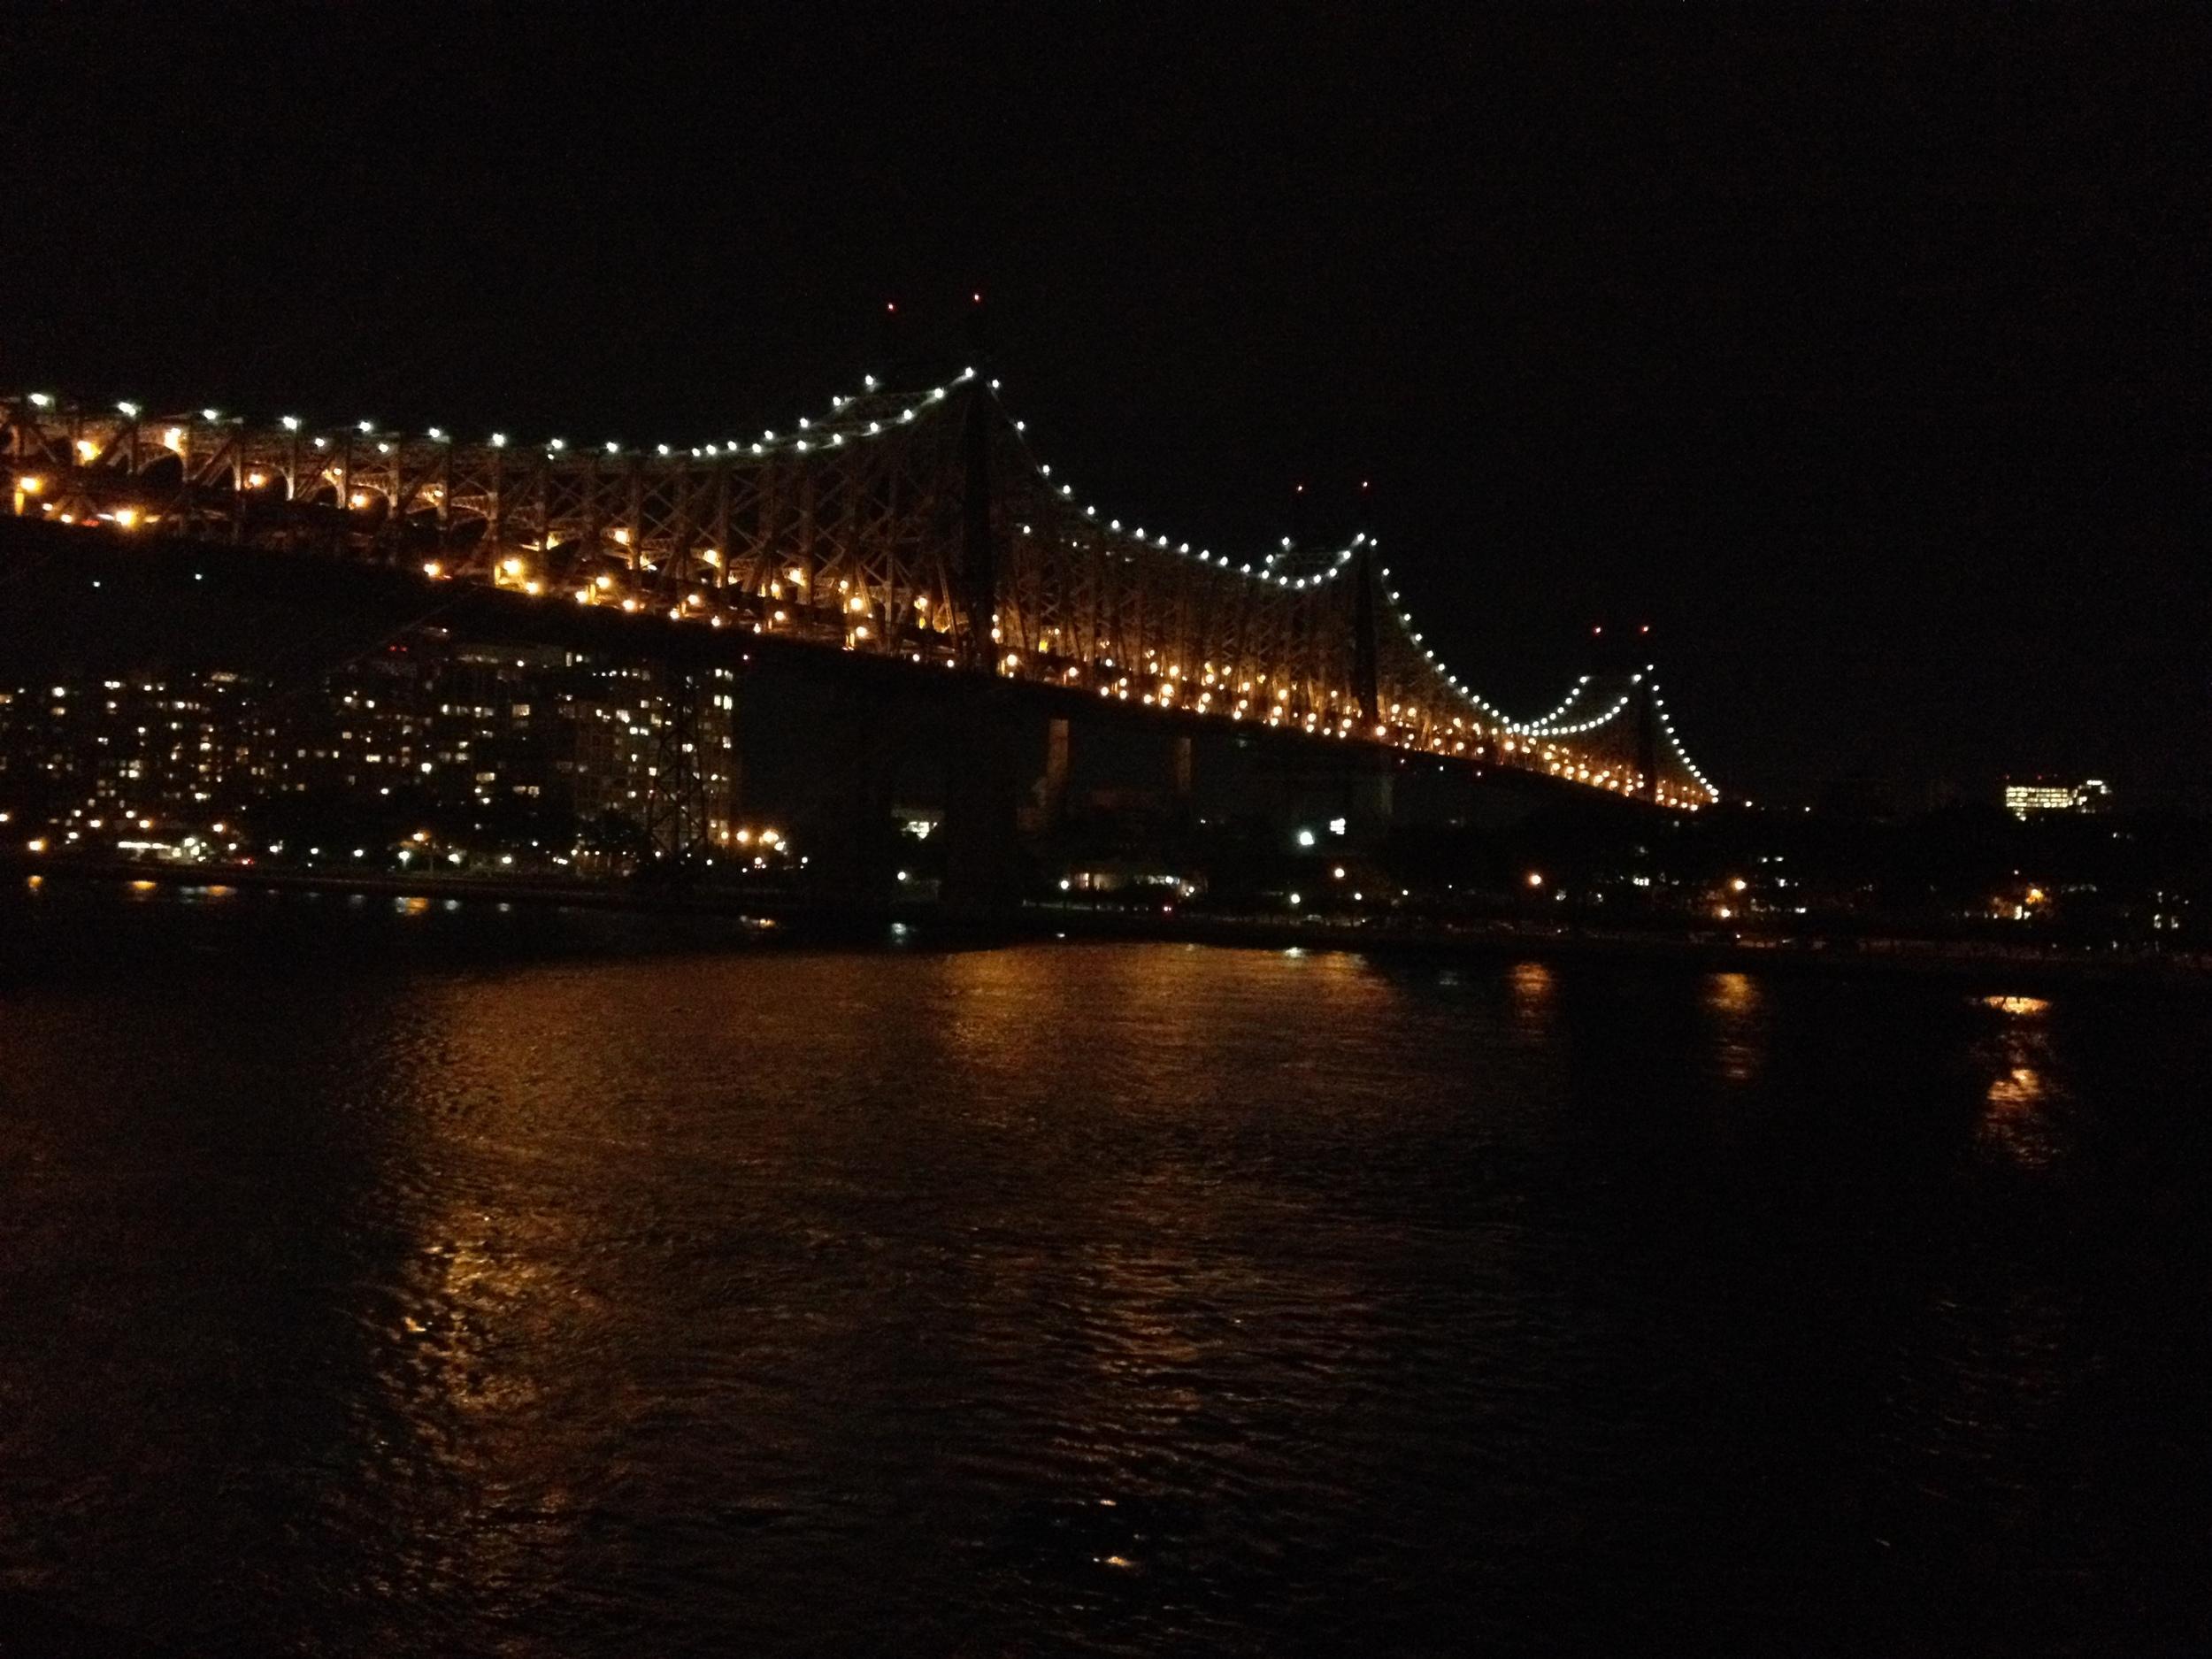 59 St Bridge lit at night